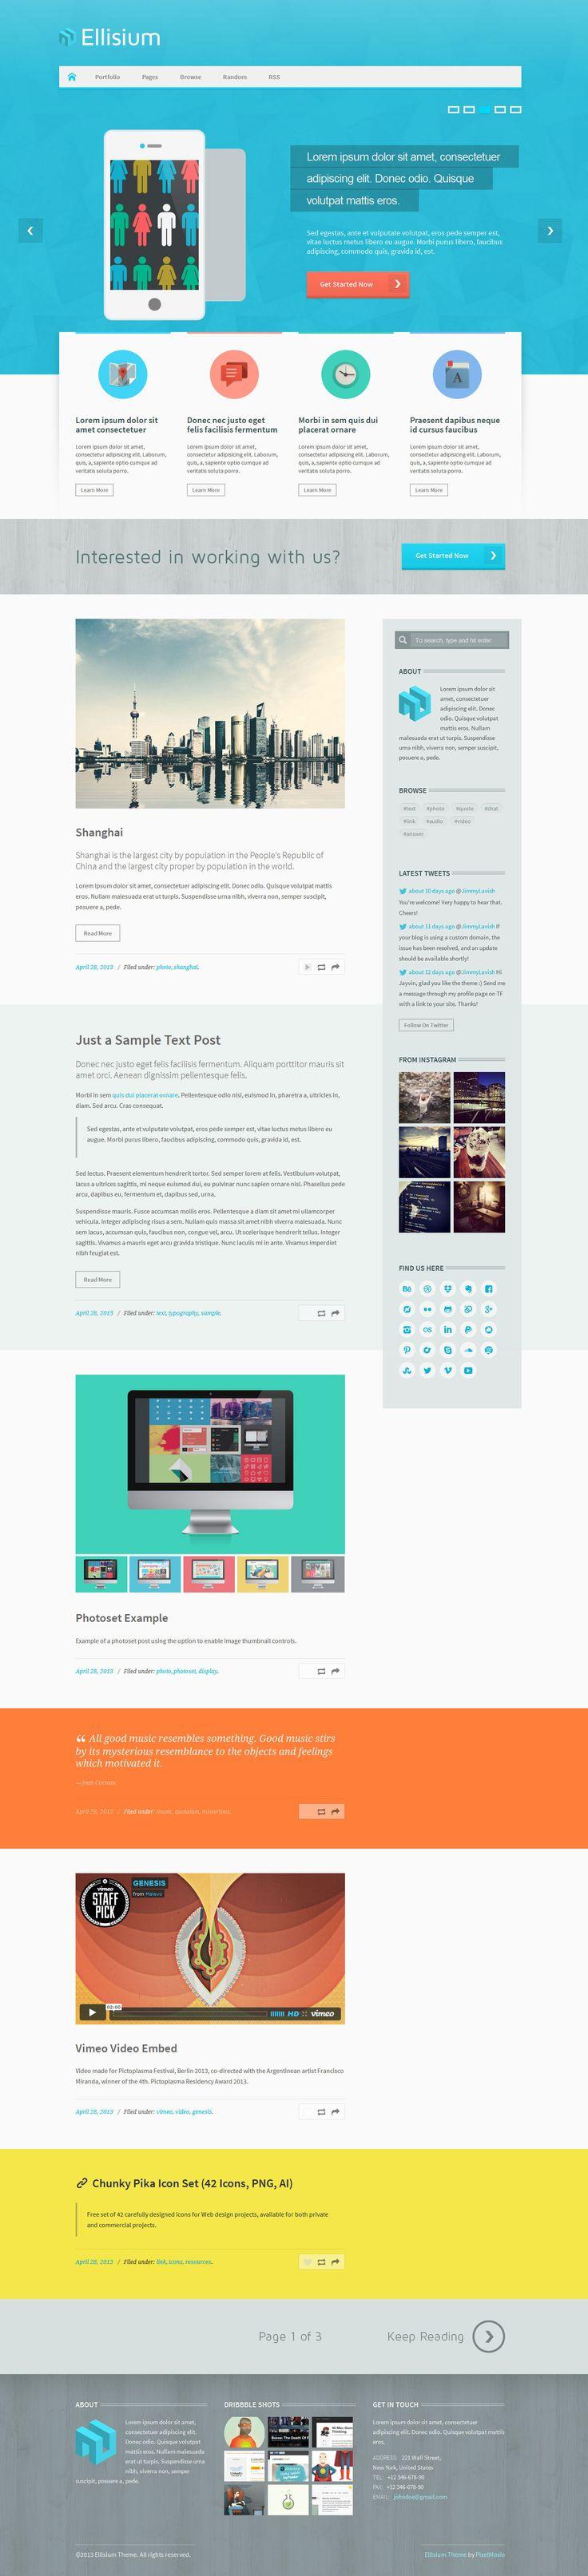 Ellisium- Stylish Tumblr theme - #tumblr #theme #tumblrtheme #design #webdesign #creative #inspiration